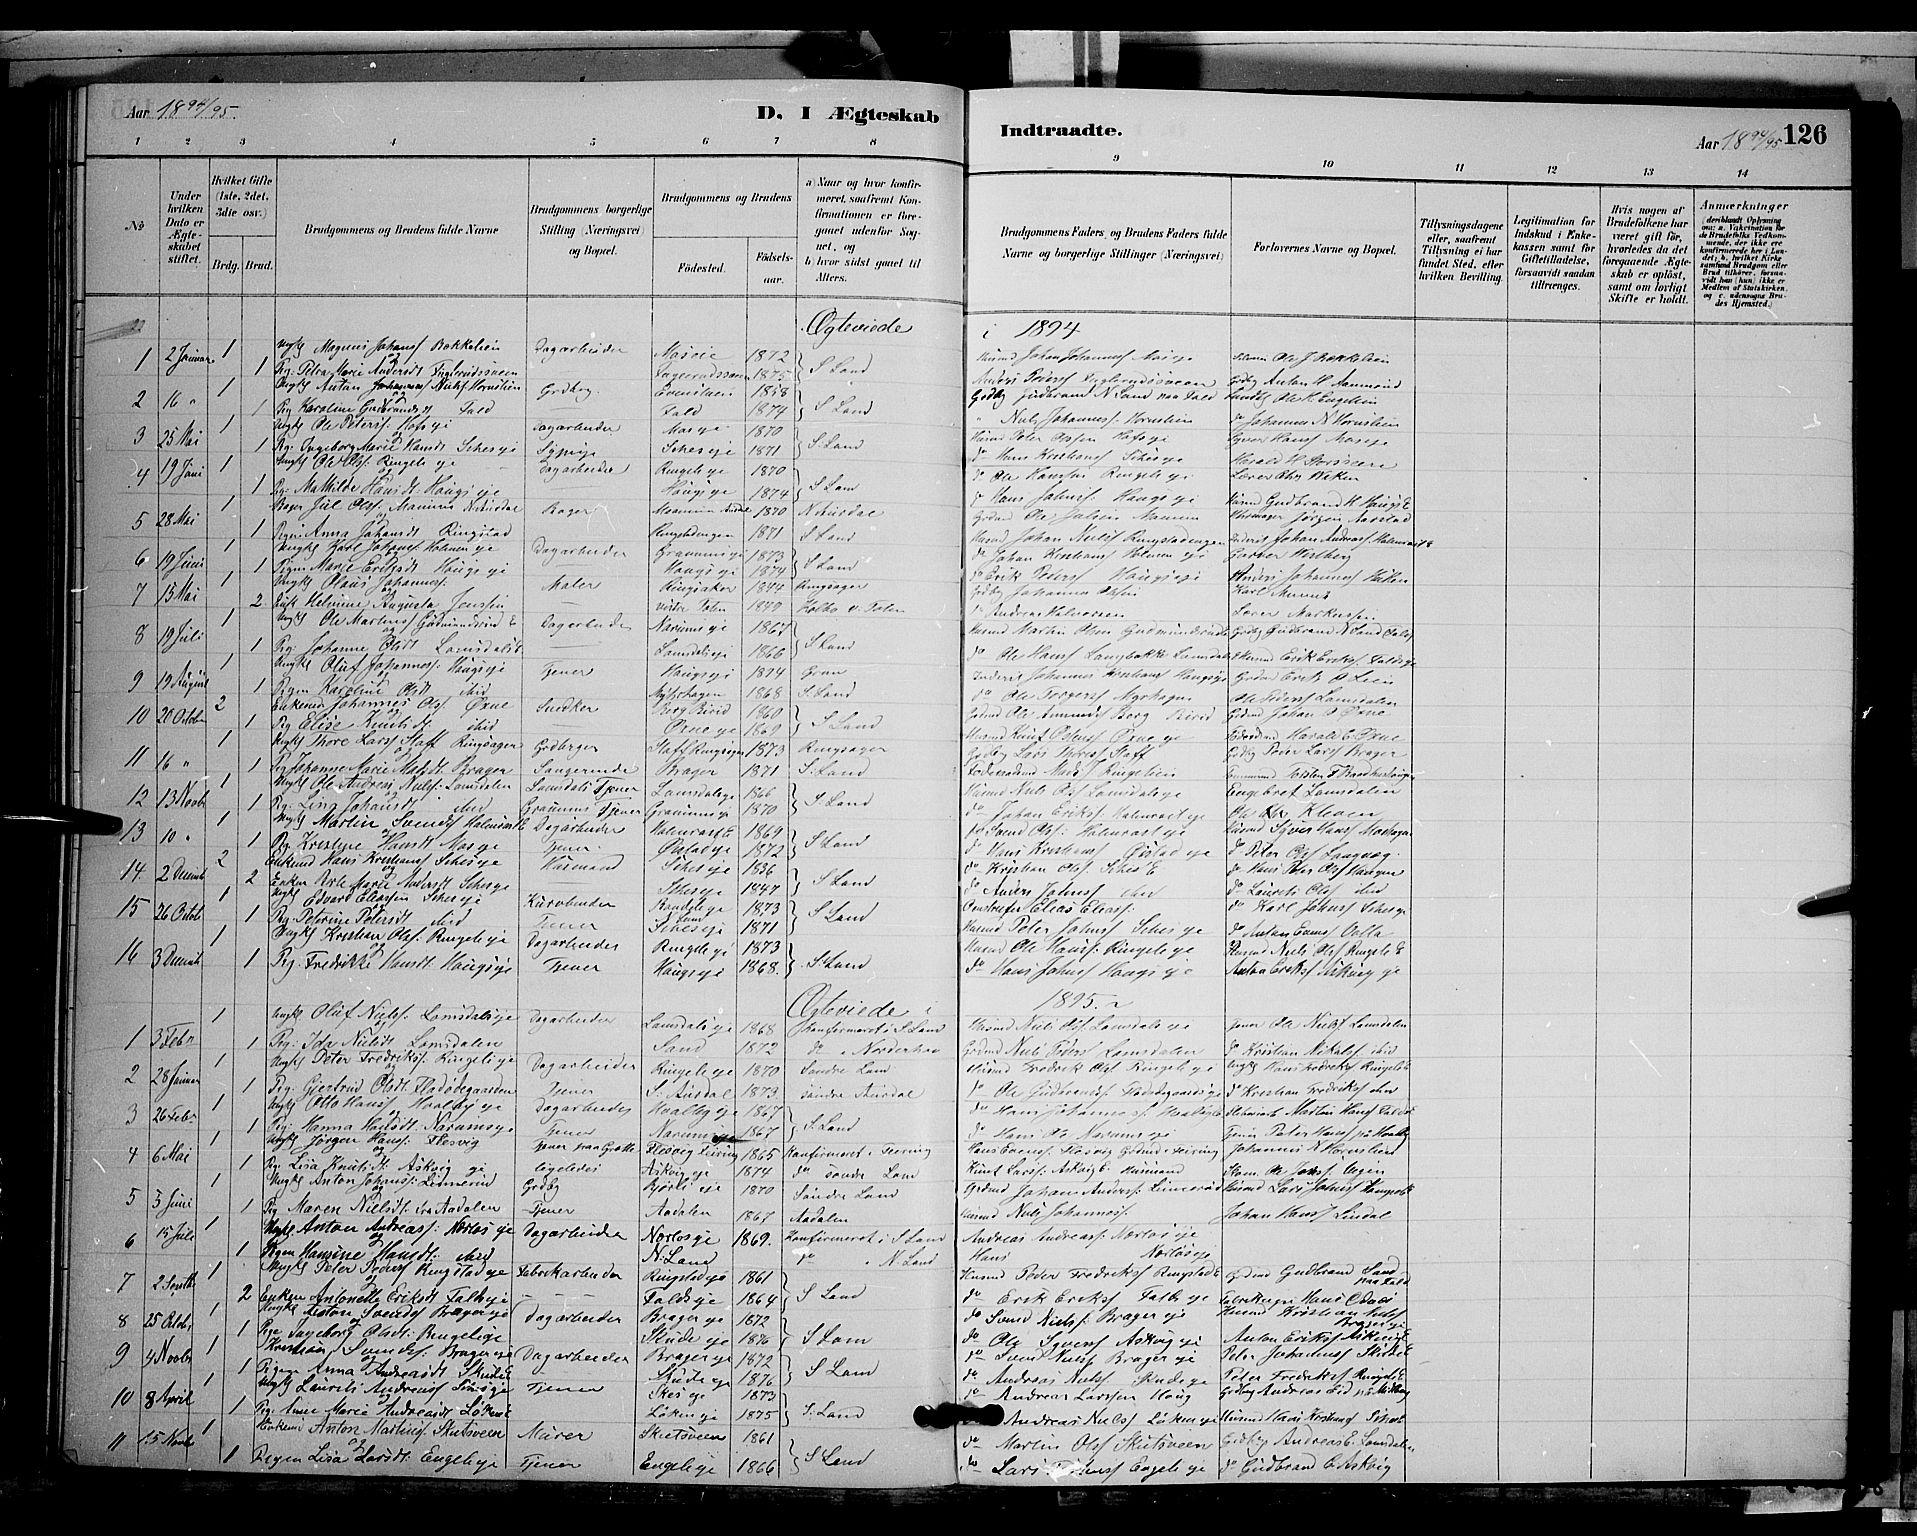 SAH, Søndre Land prestekontor, L/L0002: Klokkerbok nr. 2, 1884-1900, s. 126